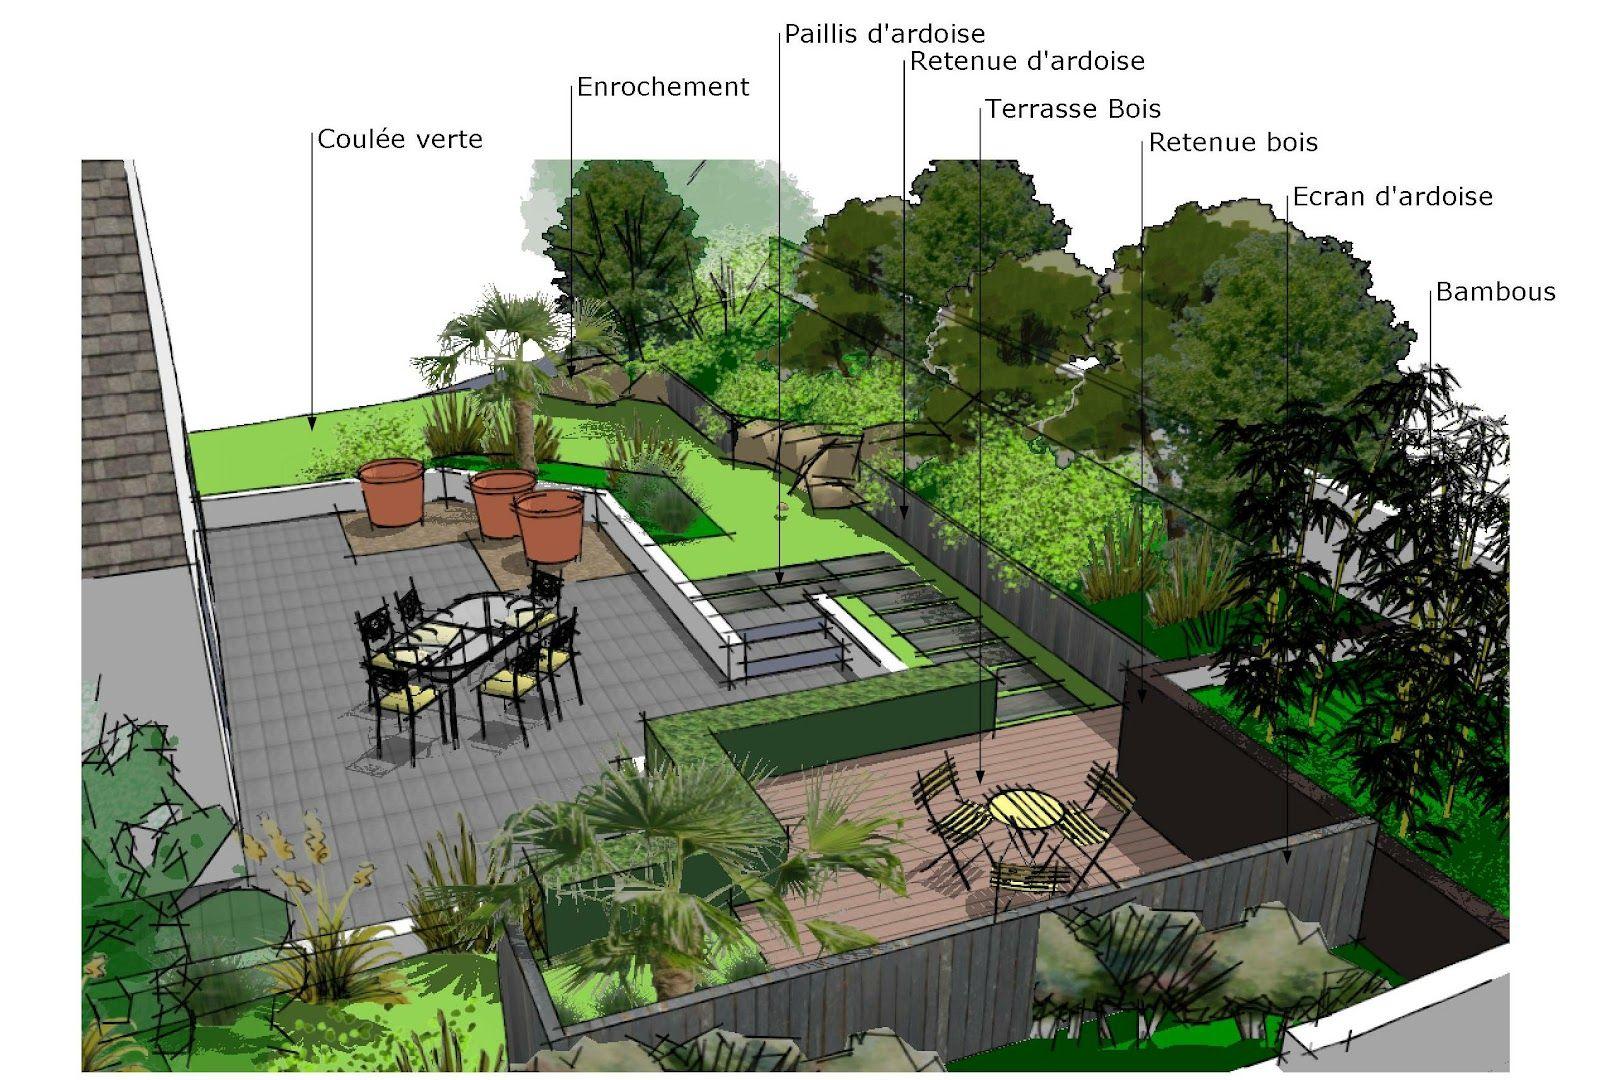 Fabuleux MAEZAD+-+RISCLES+Paysage+Projet.jpg 1 600 × 1 080 pixels | Jardins  OH34